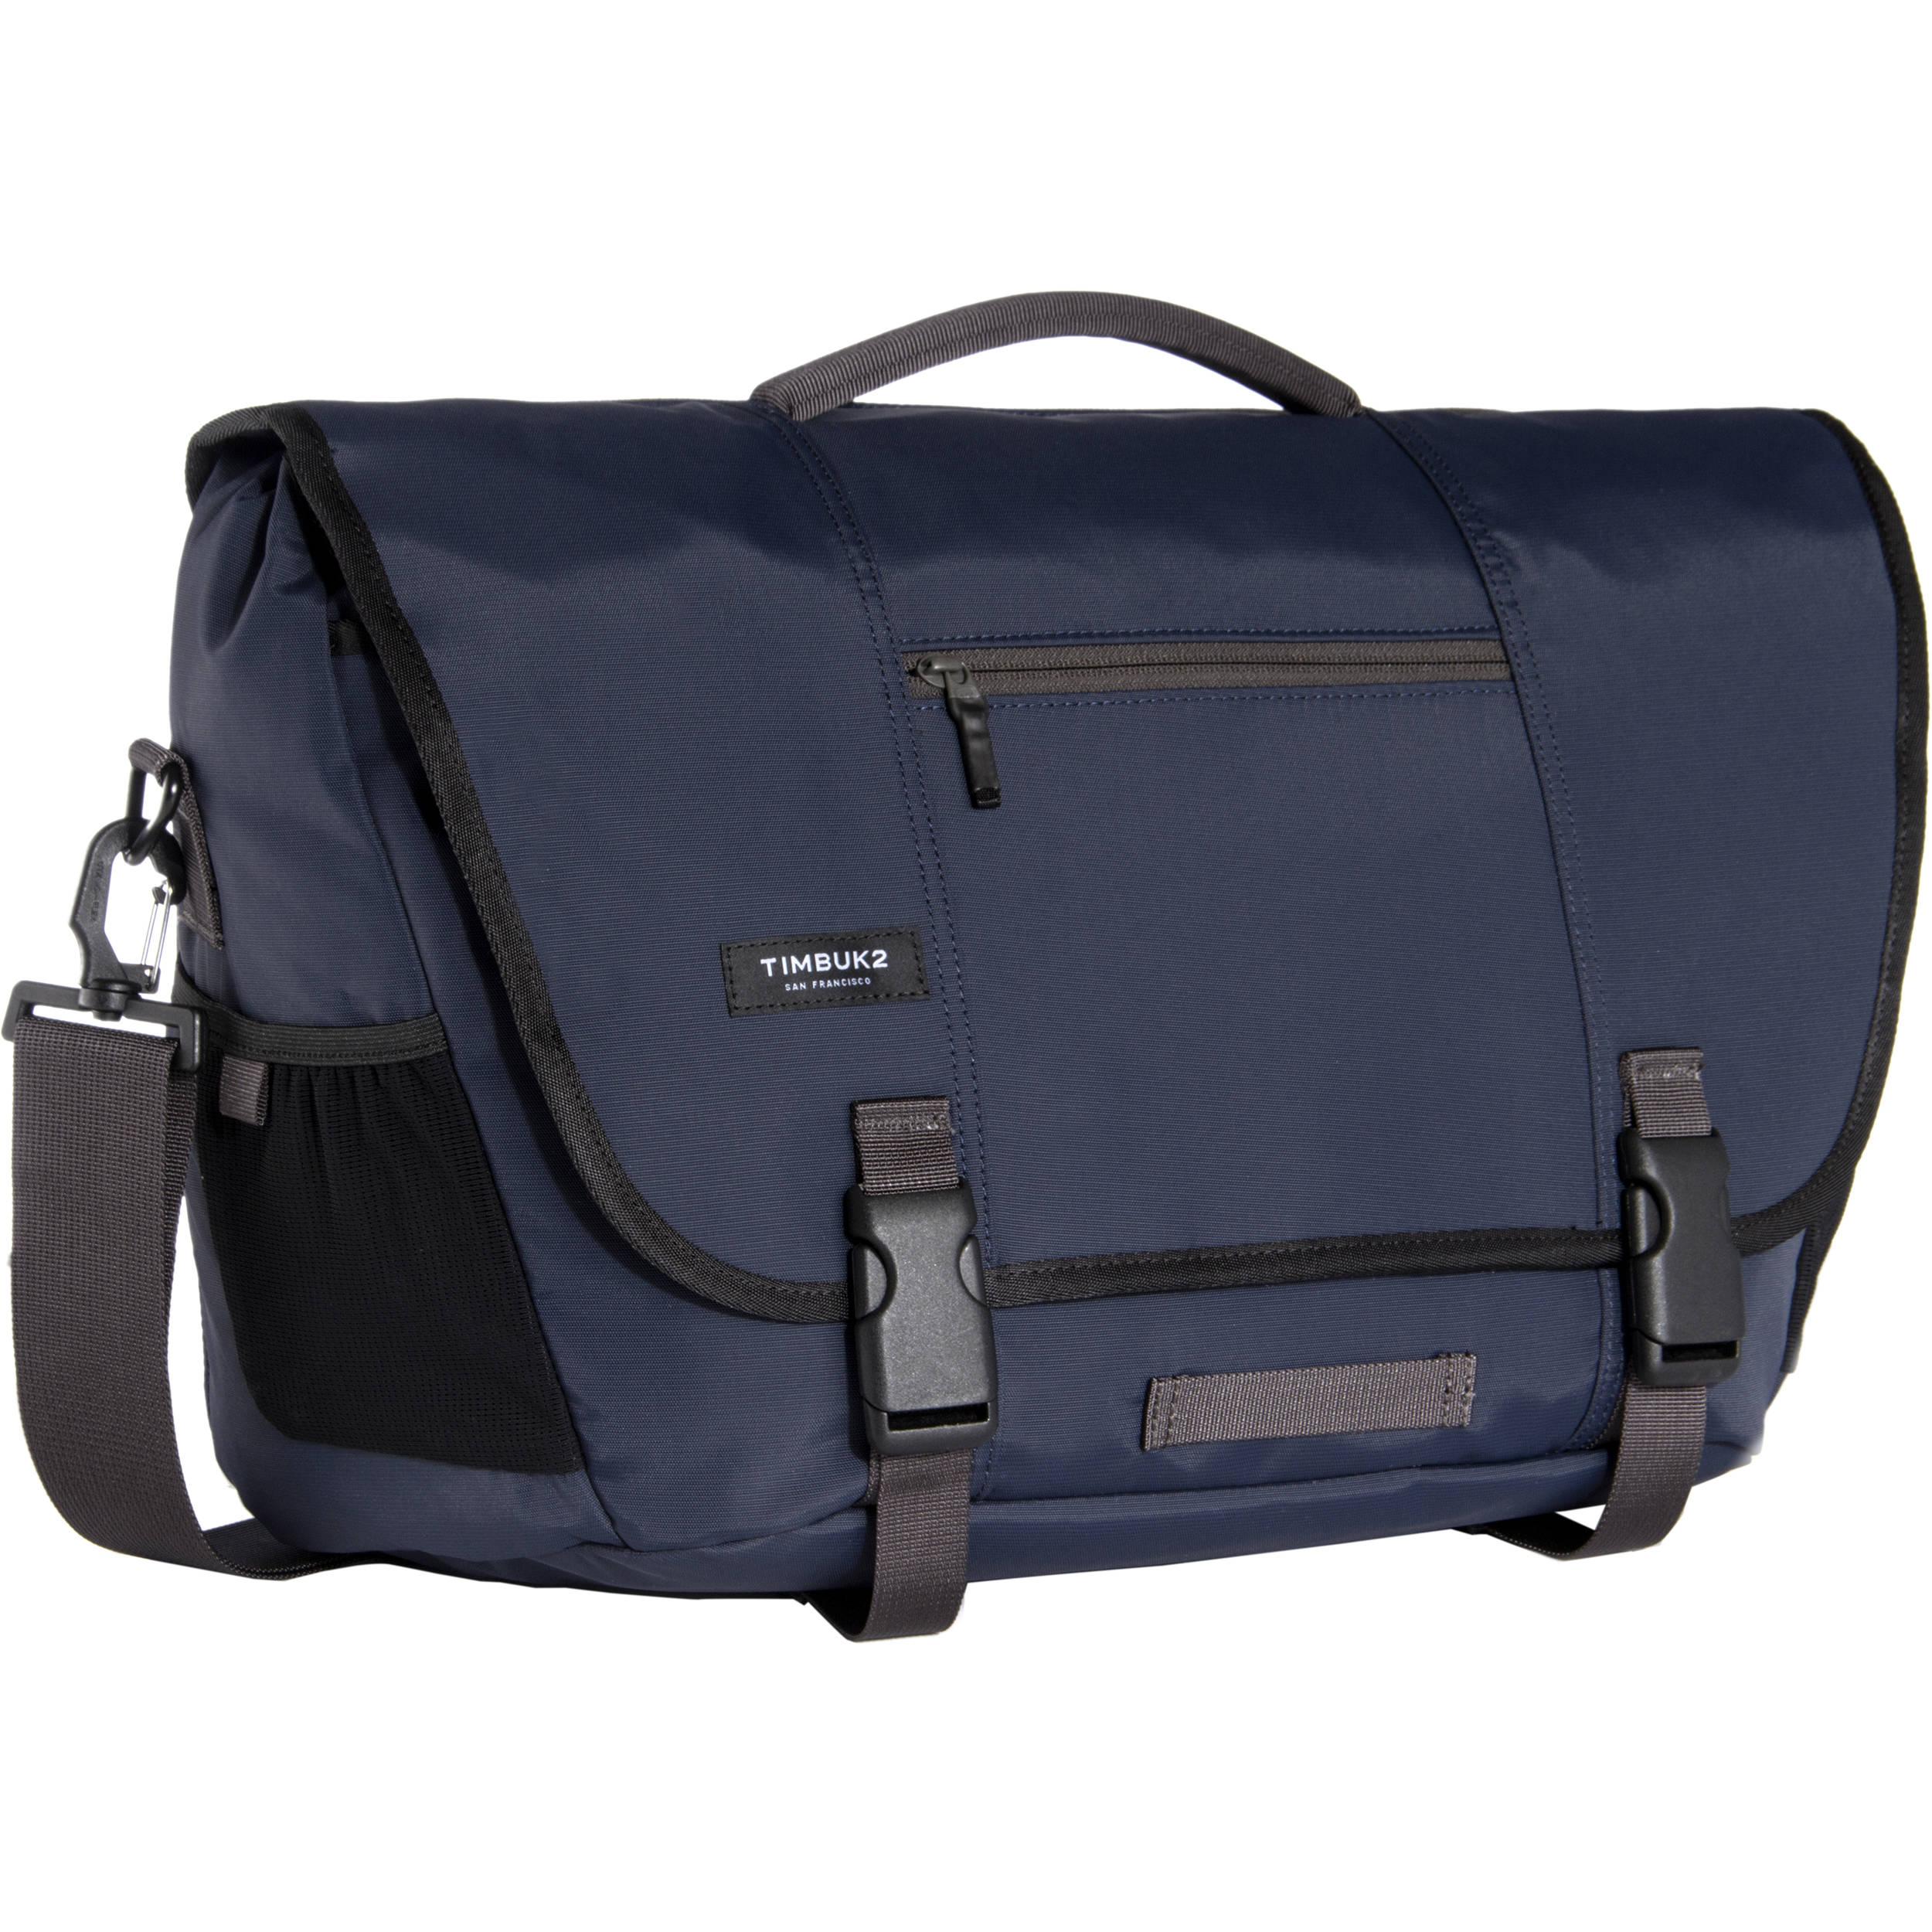 a3a7633bd900 Timbuk2 Commute Messenger Bag (Large